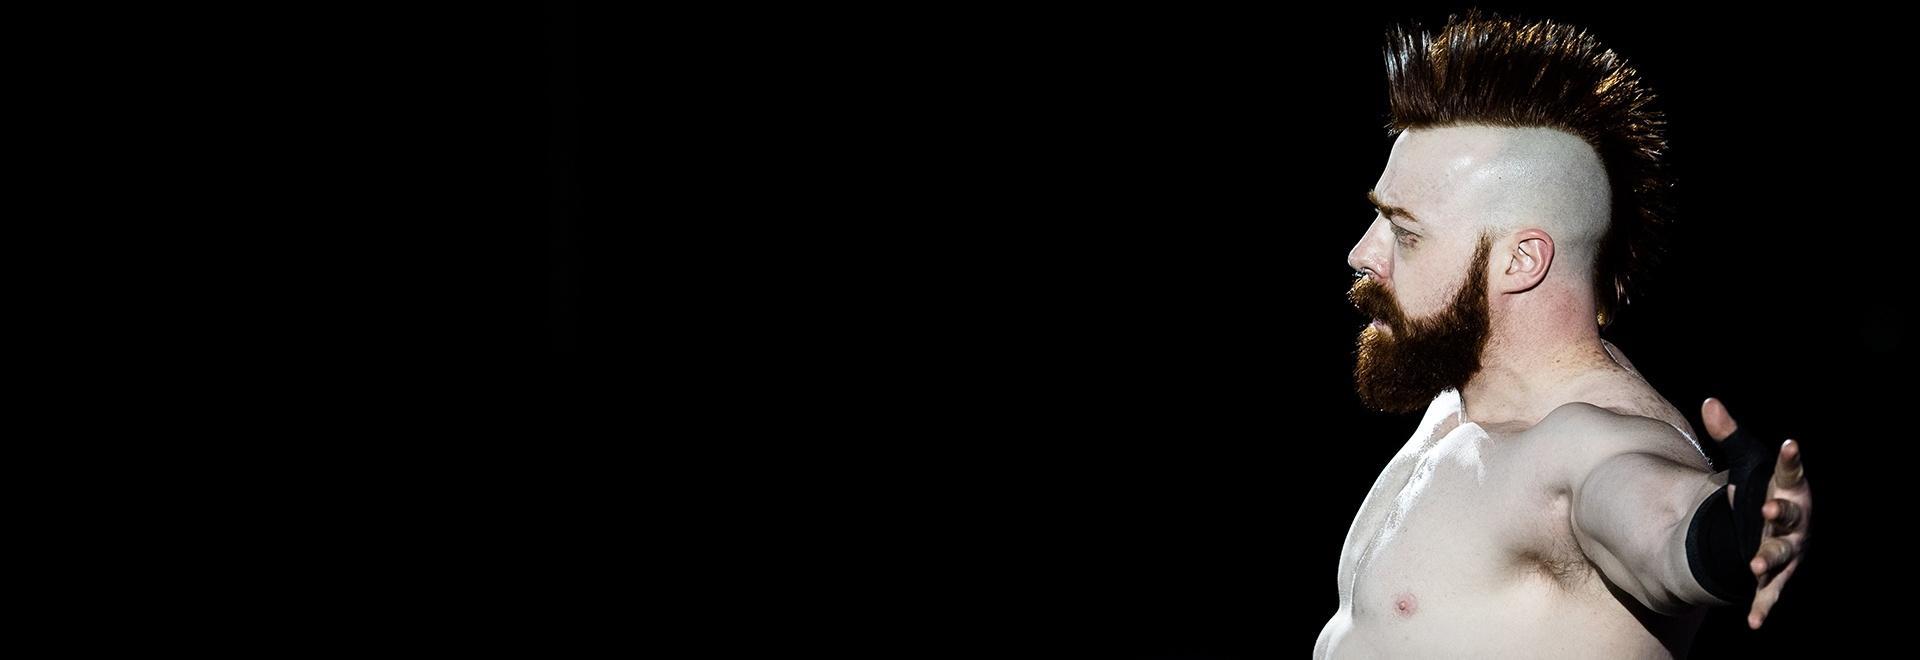 Ep. 34